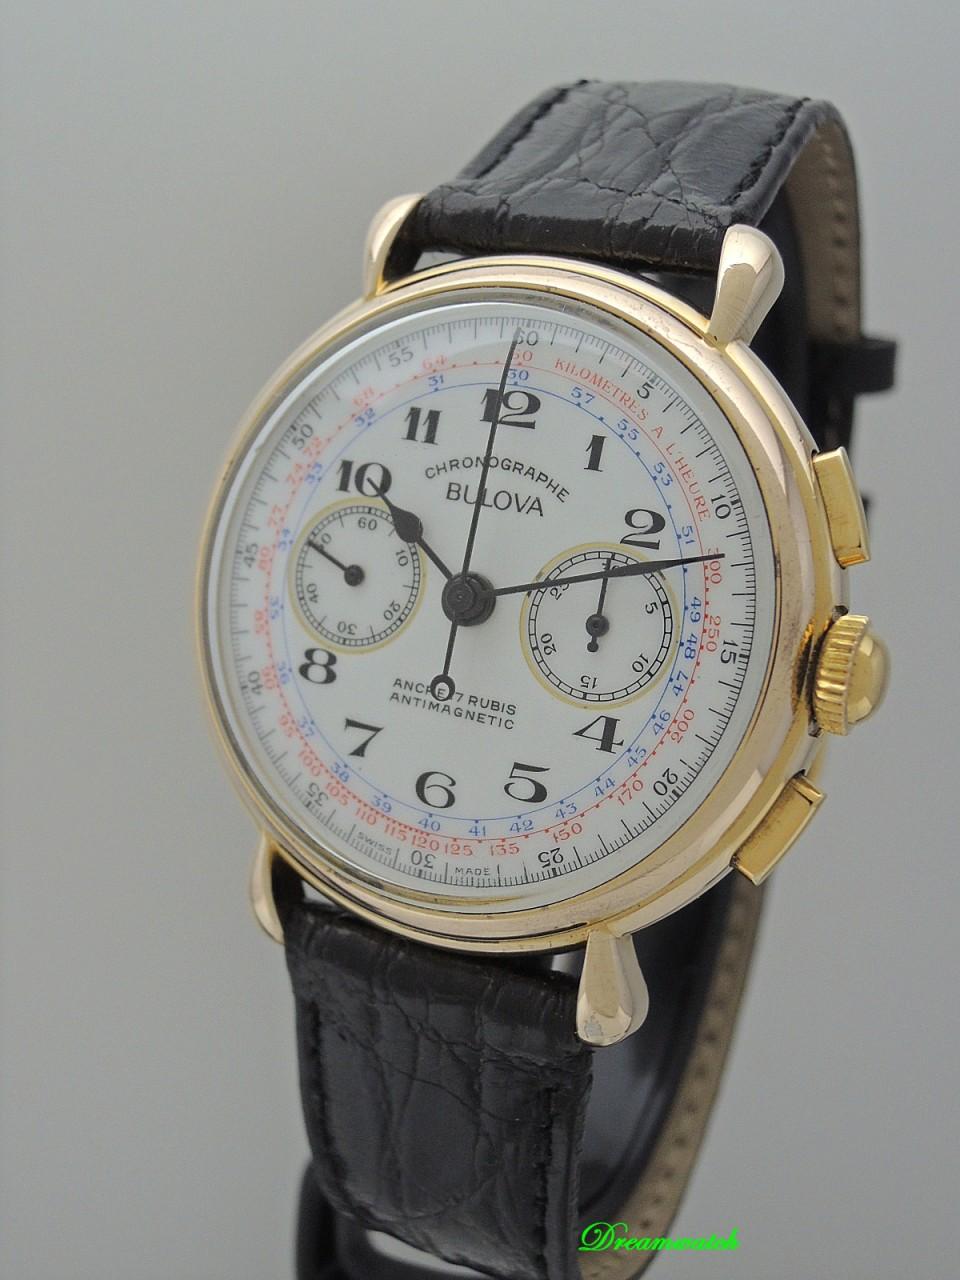 Bulova Chronograph Vintage Lemania 872